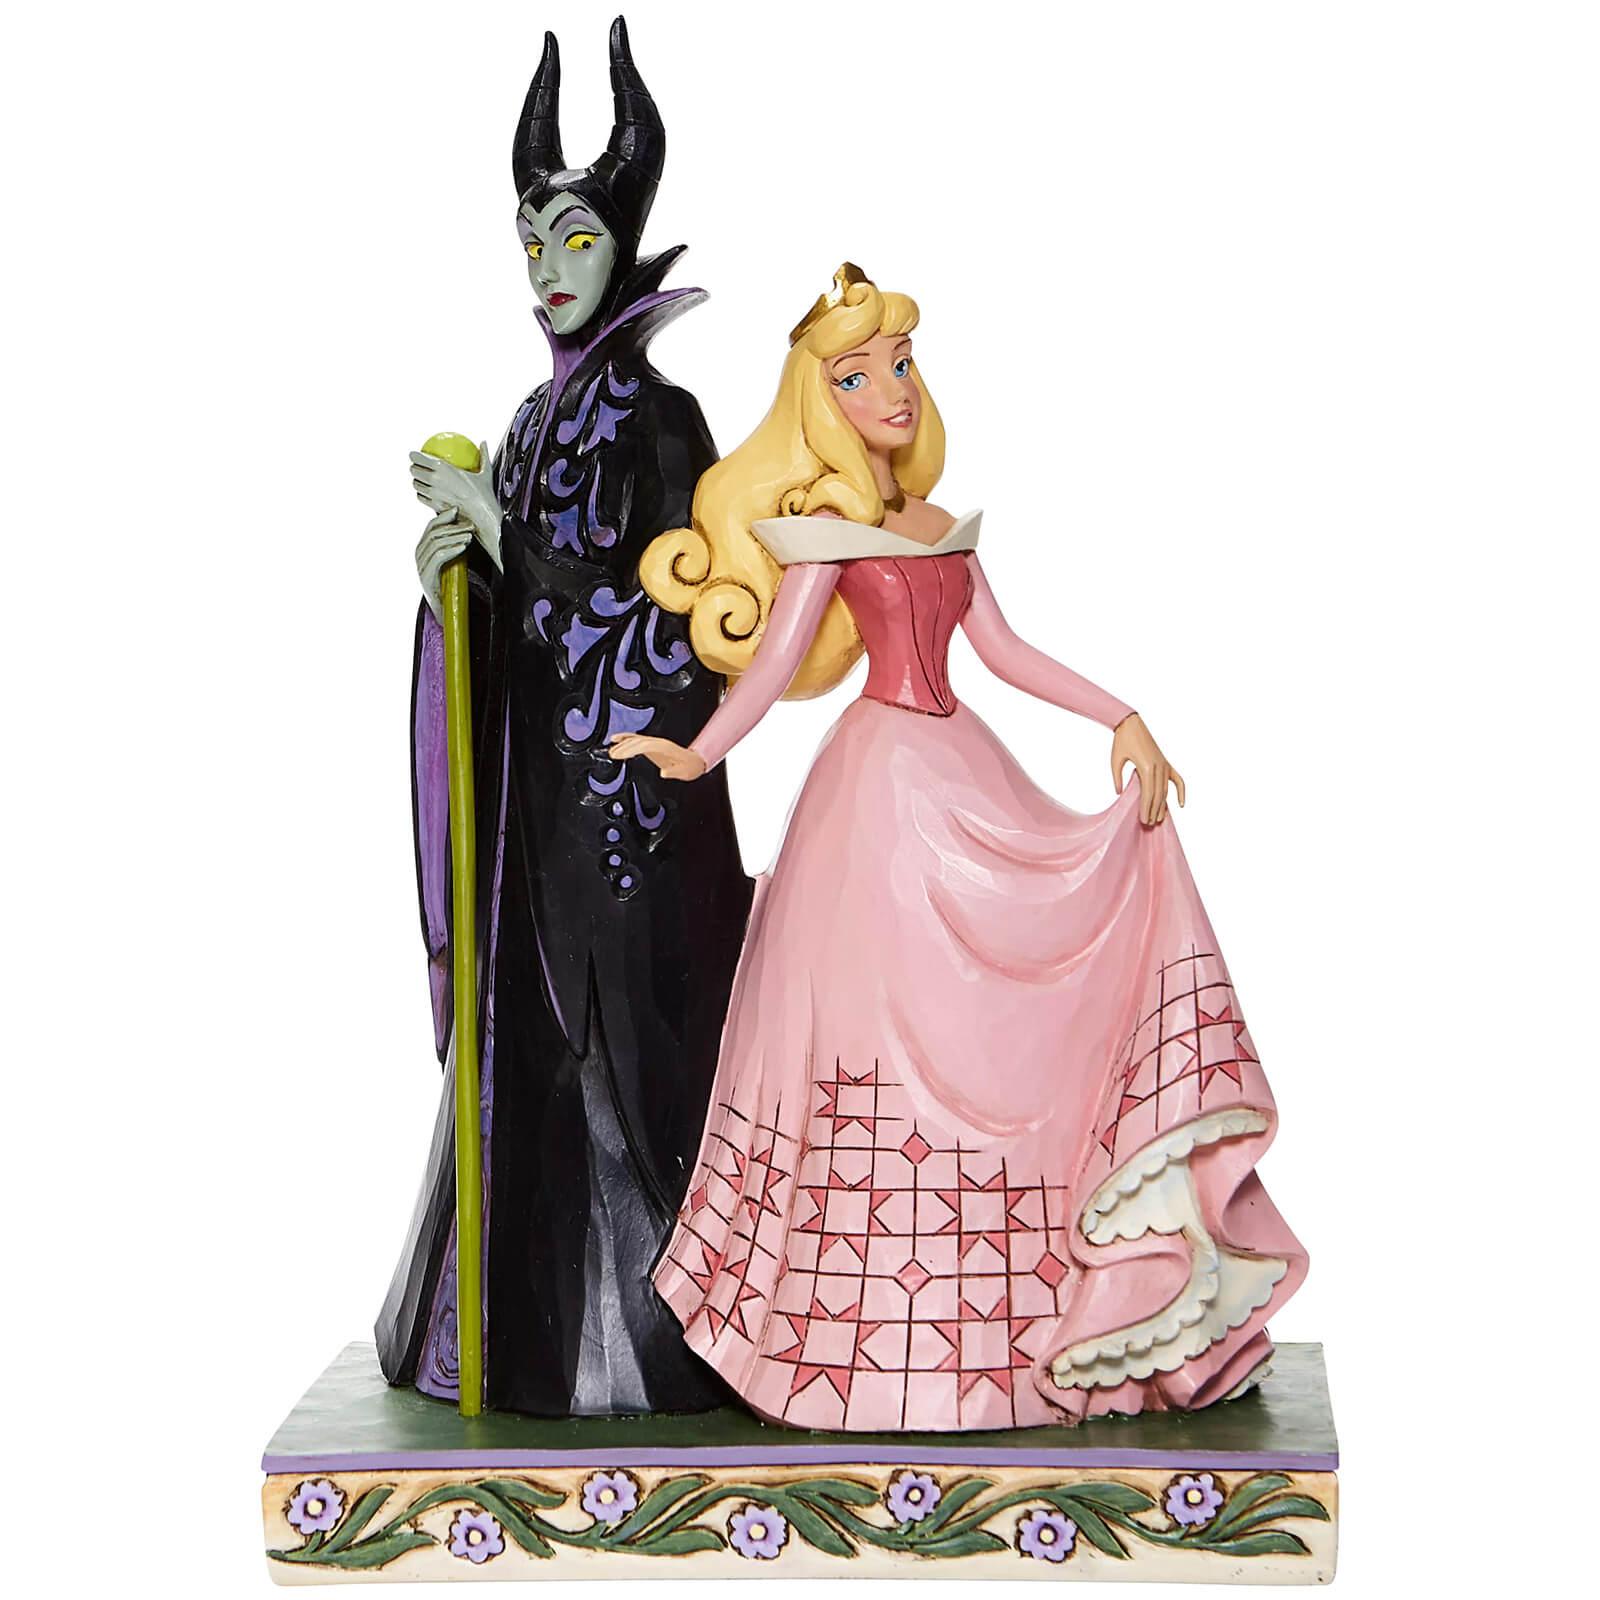 Image of Disney Aurora and Maleficent Figurine